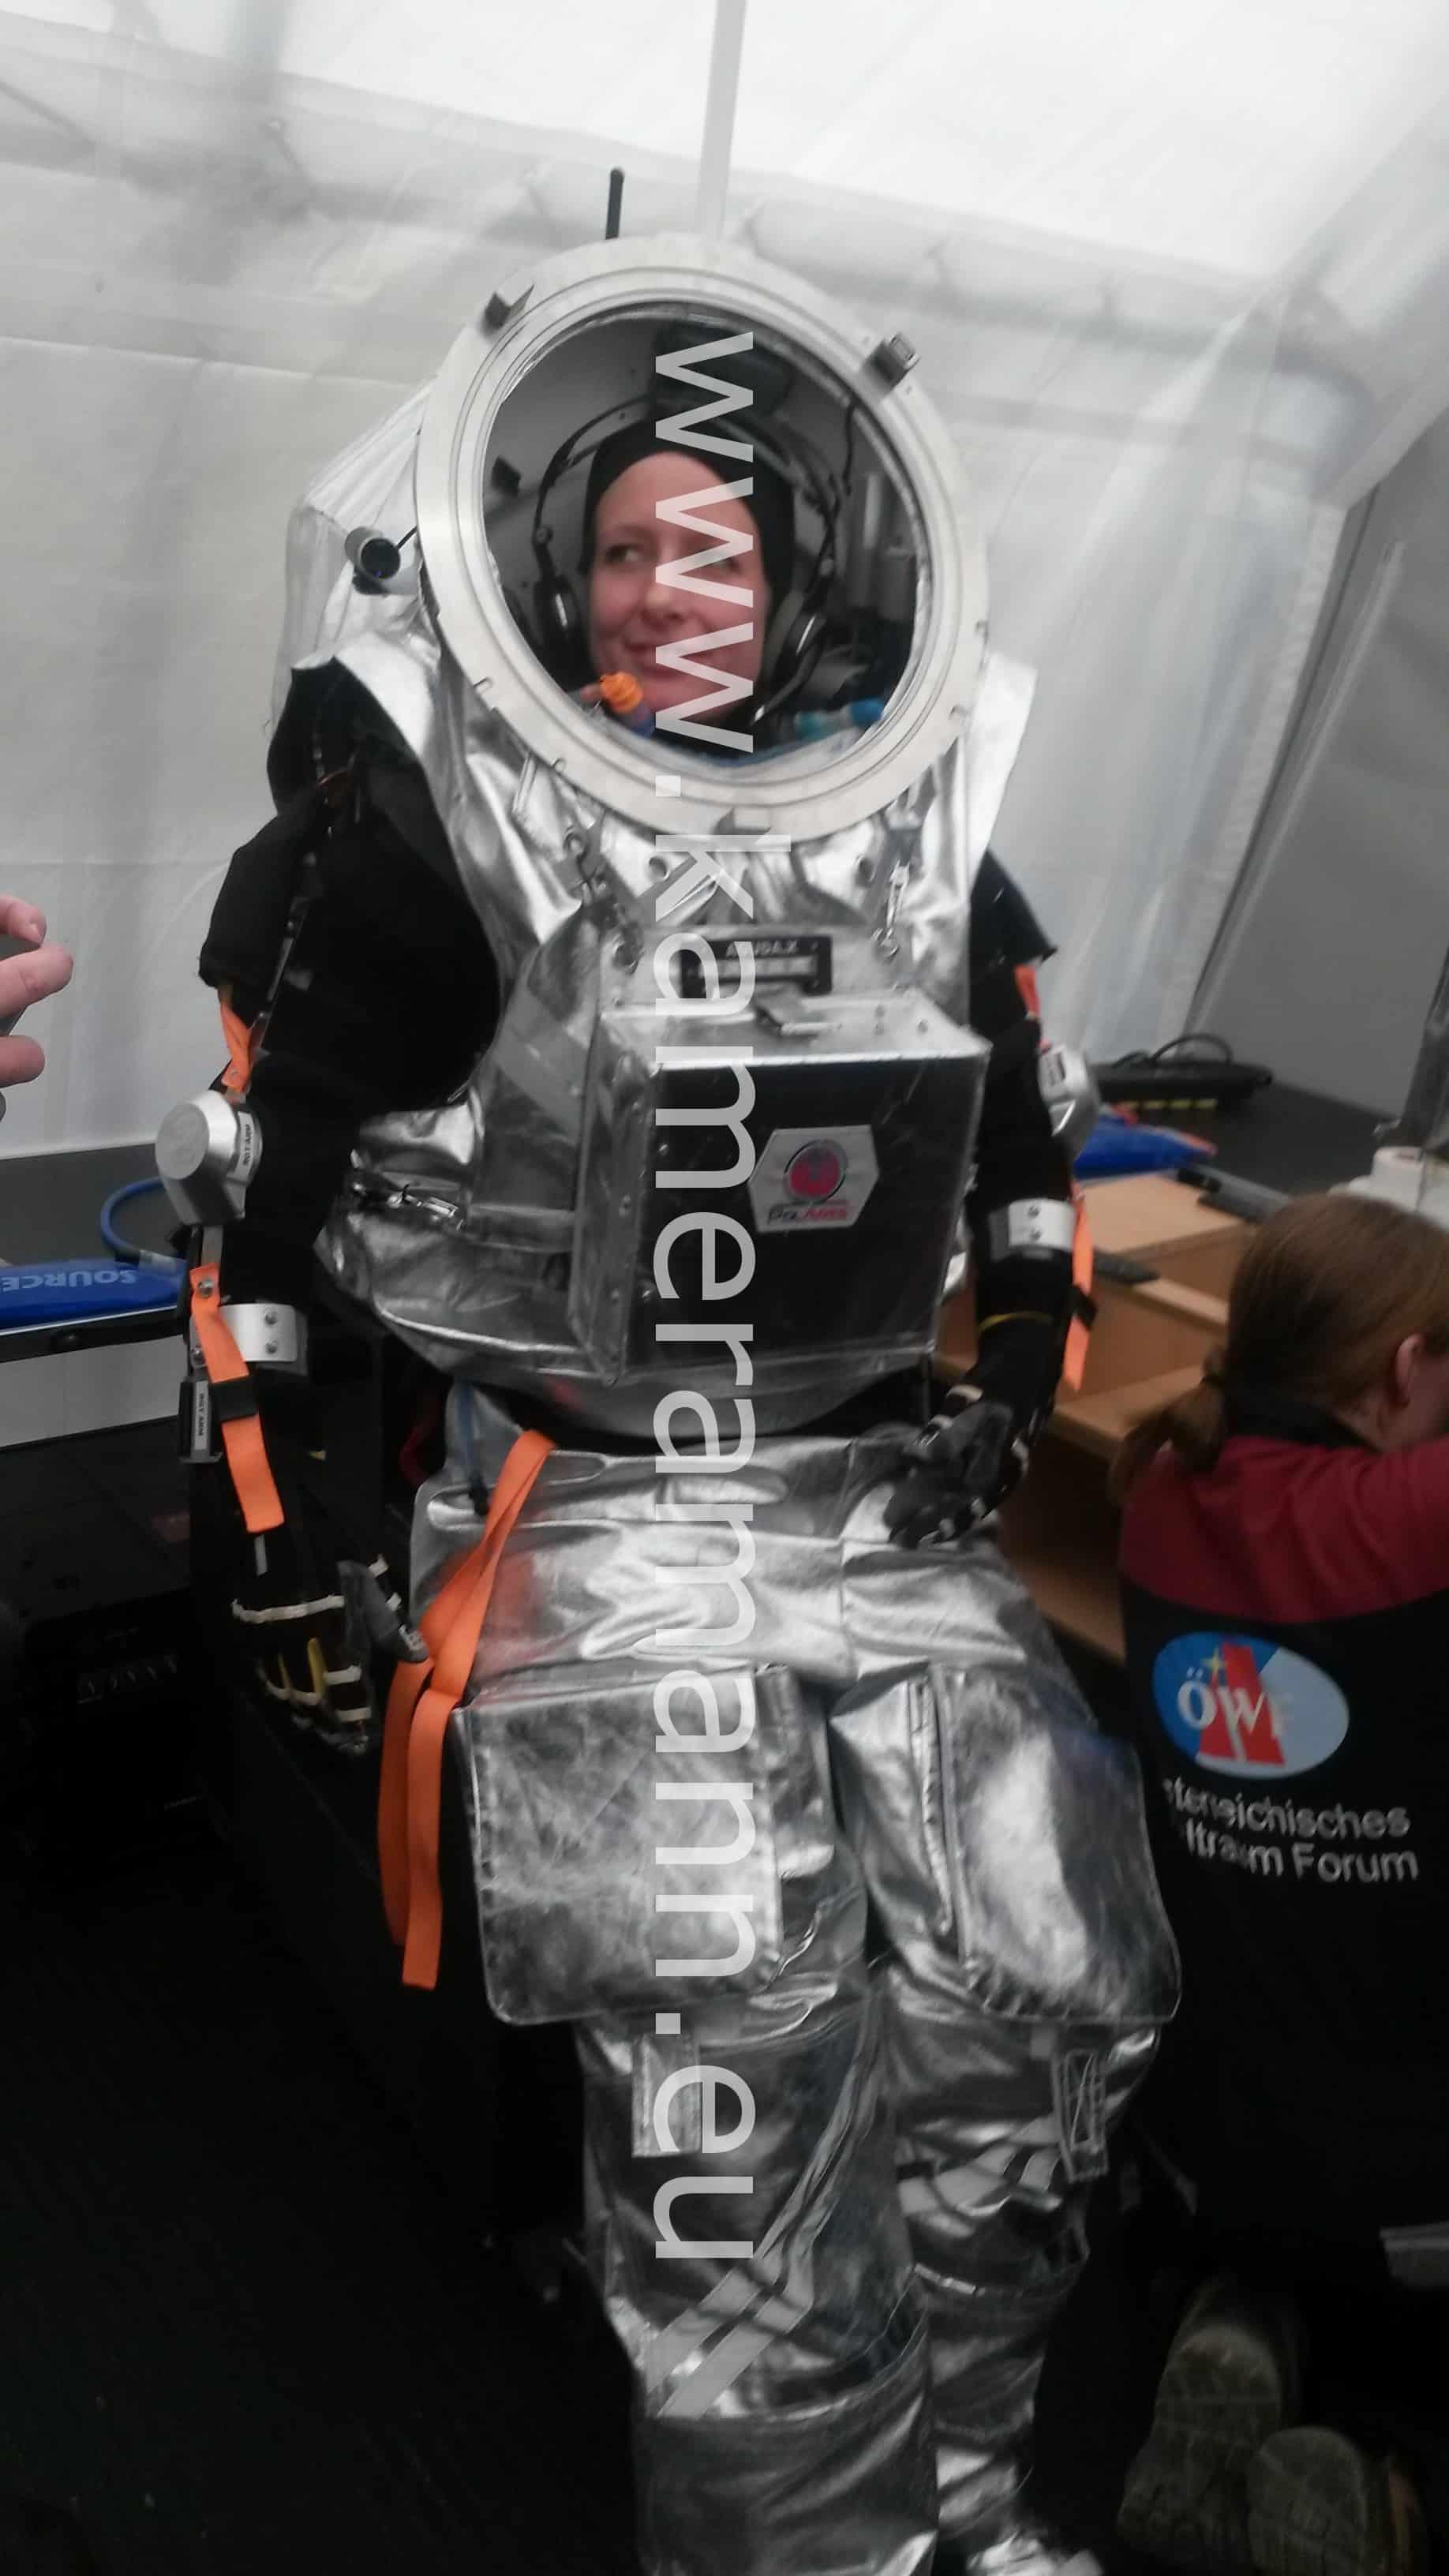 wpid 20150803 112154 e1438634690869 - ORF - Mars Simulation